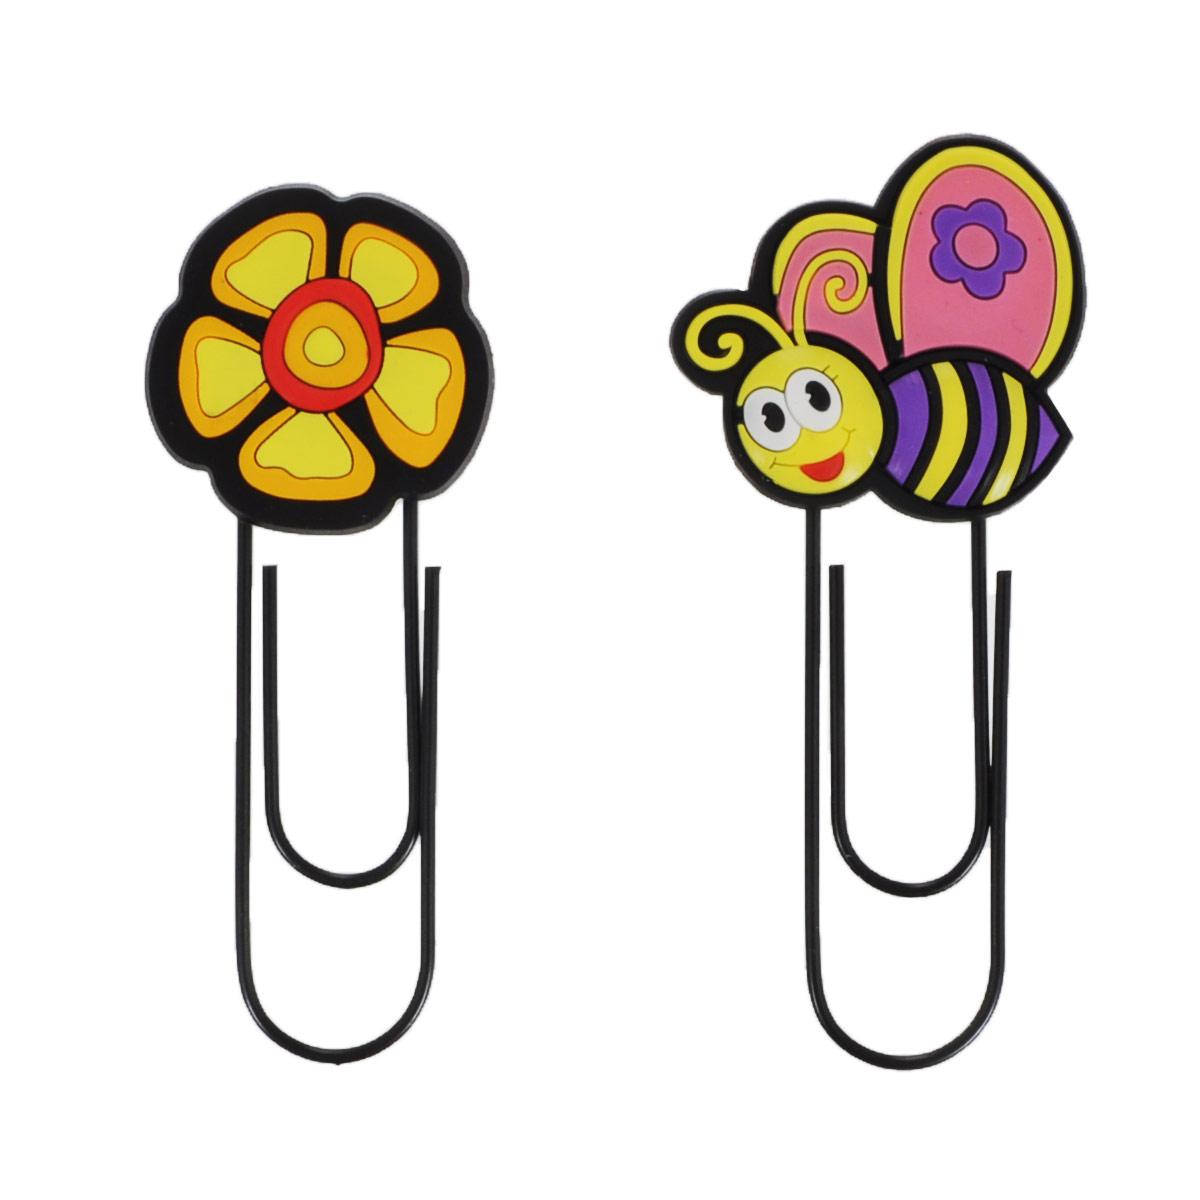 Набор скрепок-закладок Fancy  Пчелка, цветок , 2 шт. -  Закладки для книг